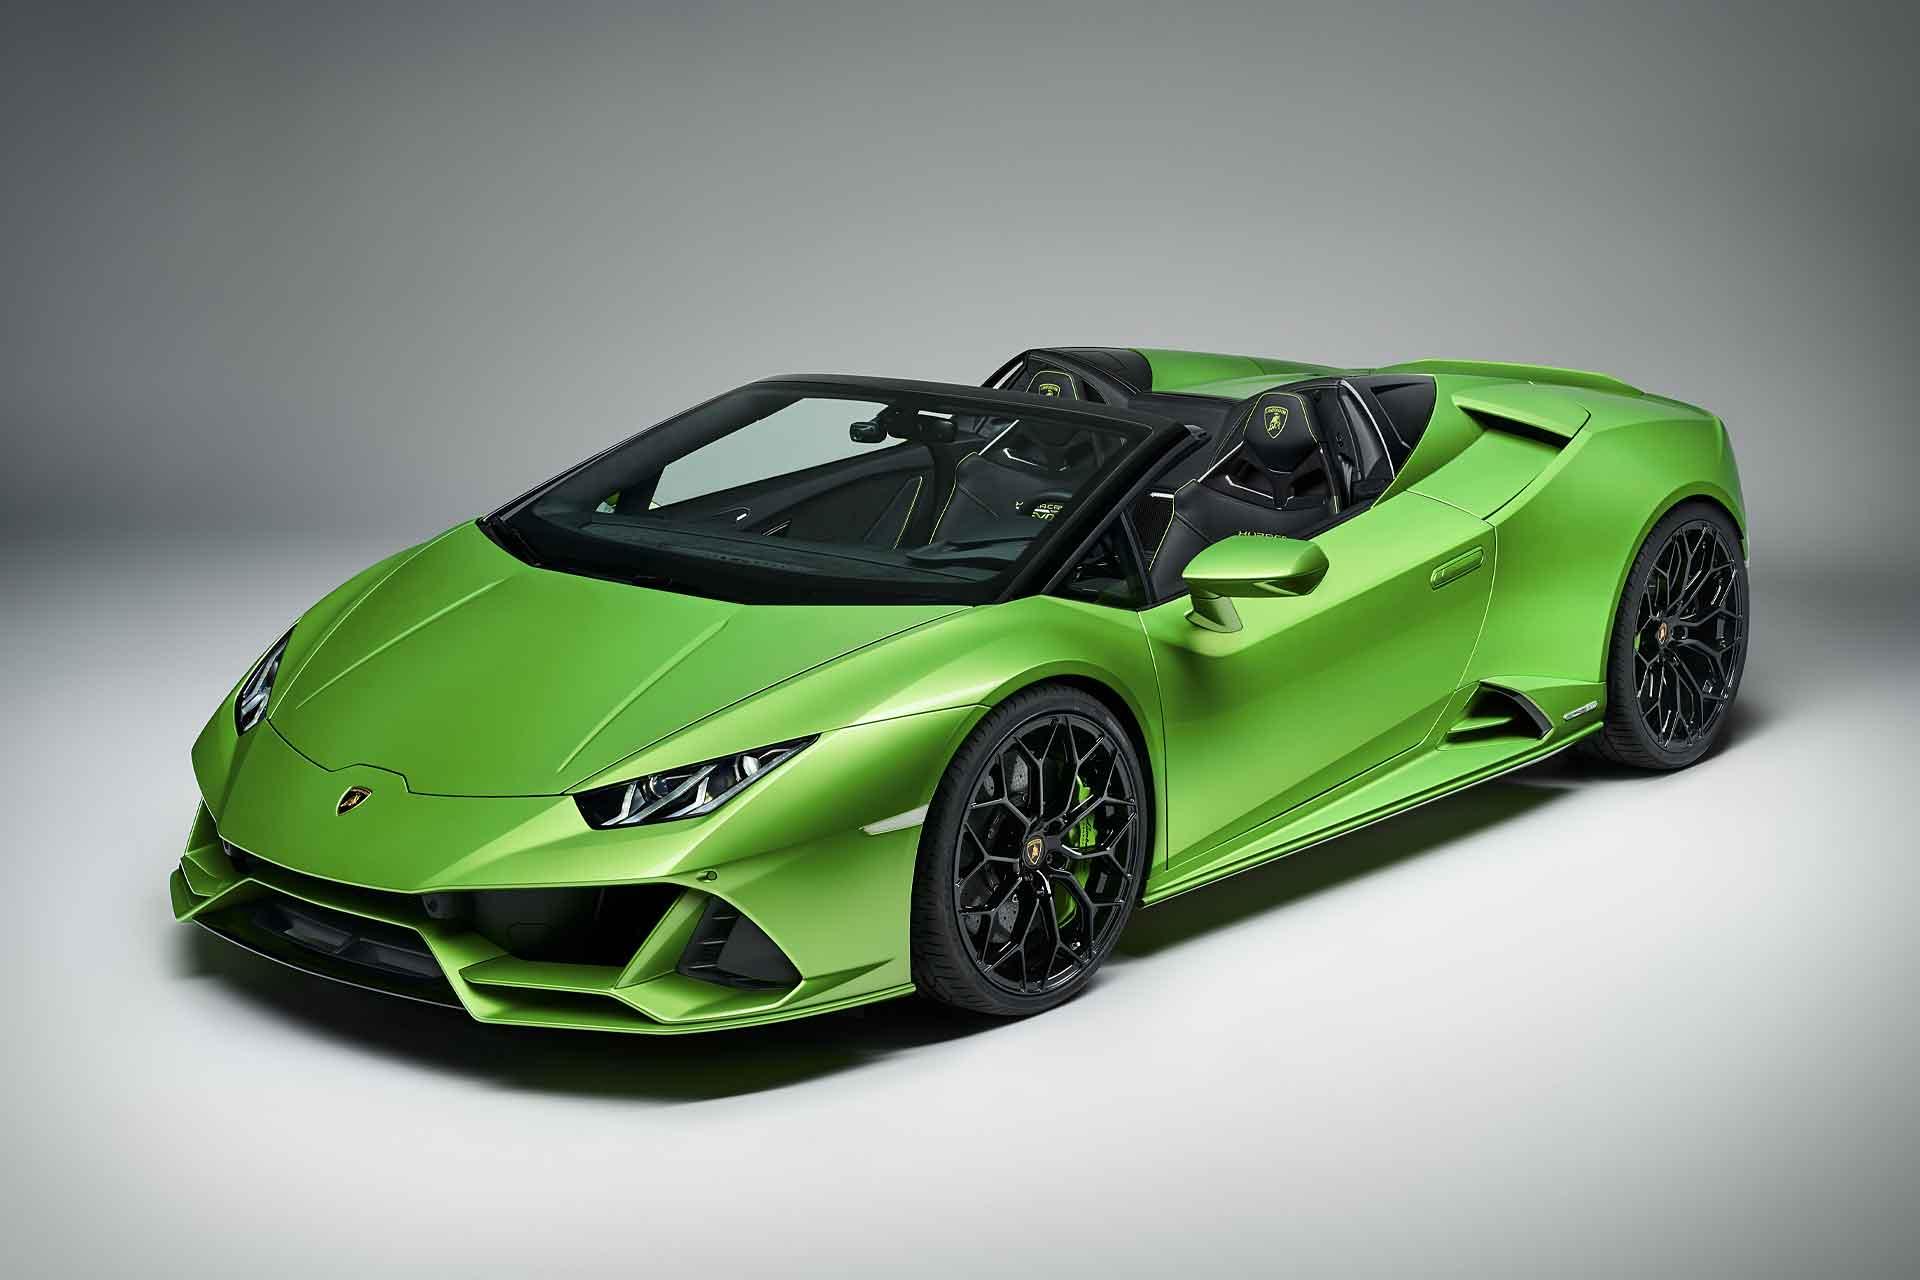 Lamborghini Huracan Evo Spyder Uncrate